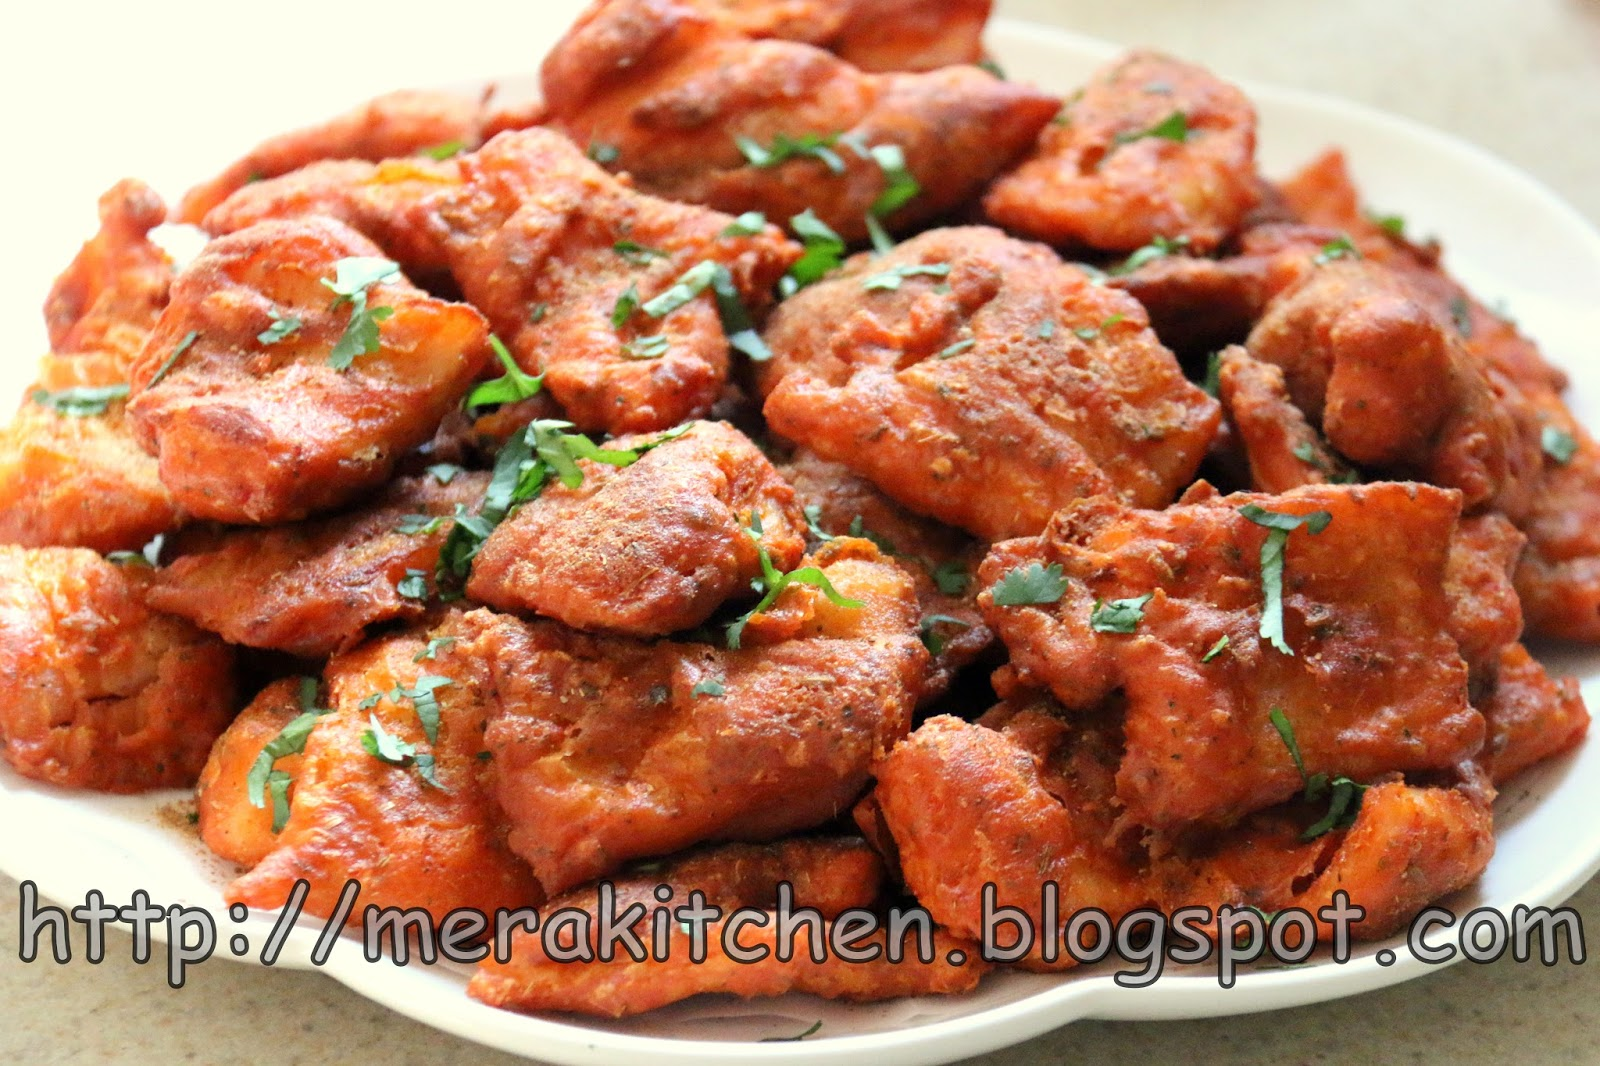 Merakitchen amritsari fish fry for Amritsari cuisine